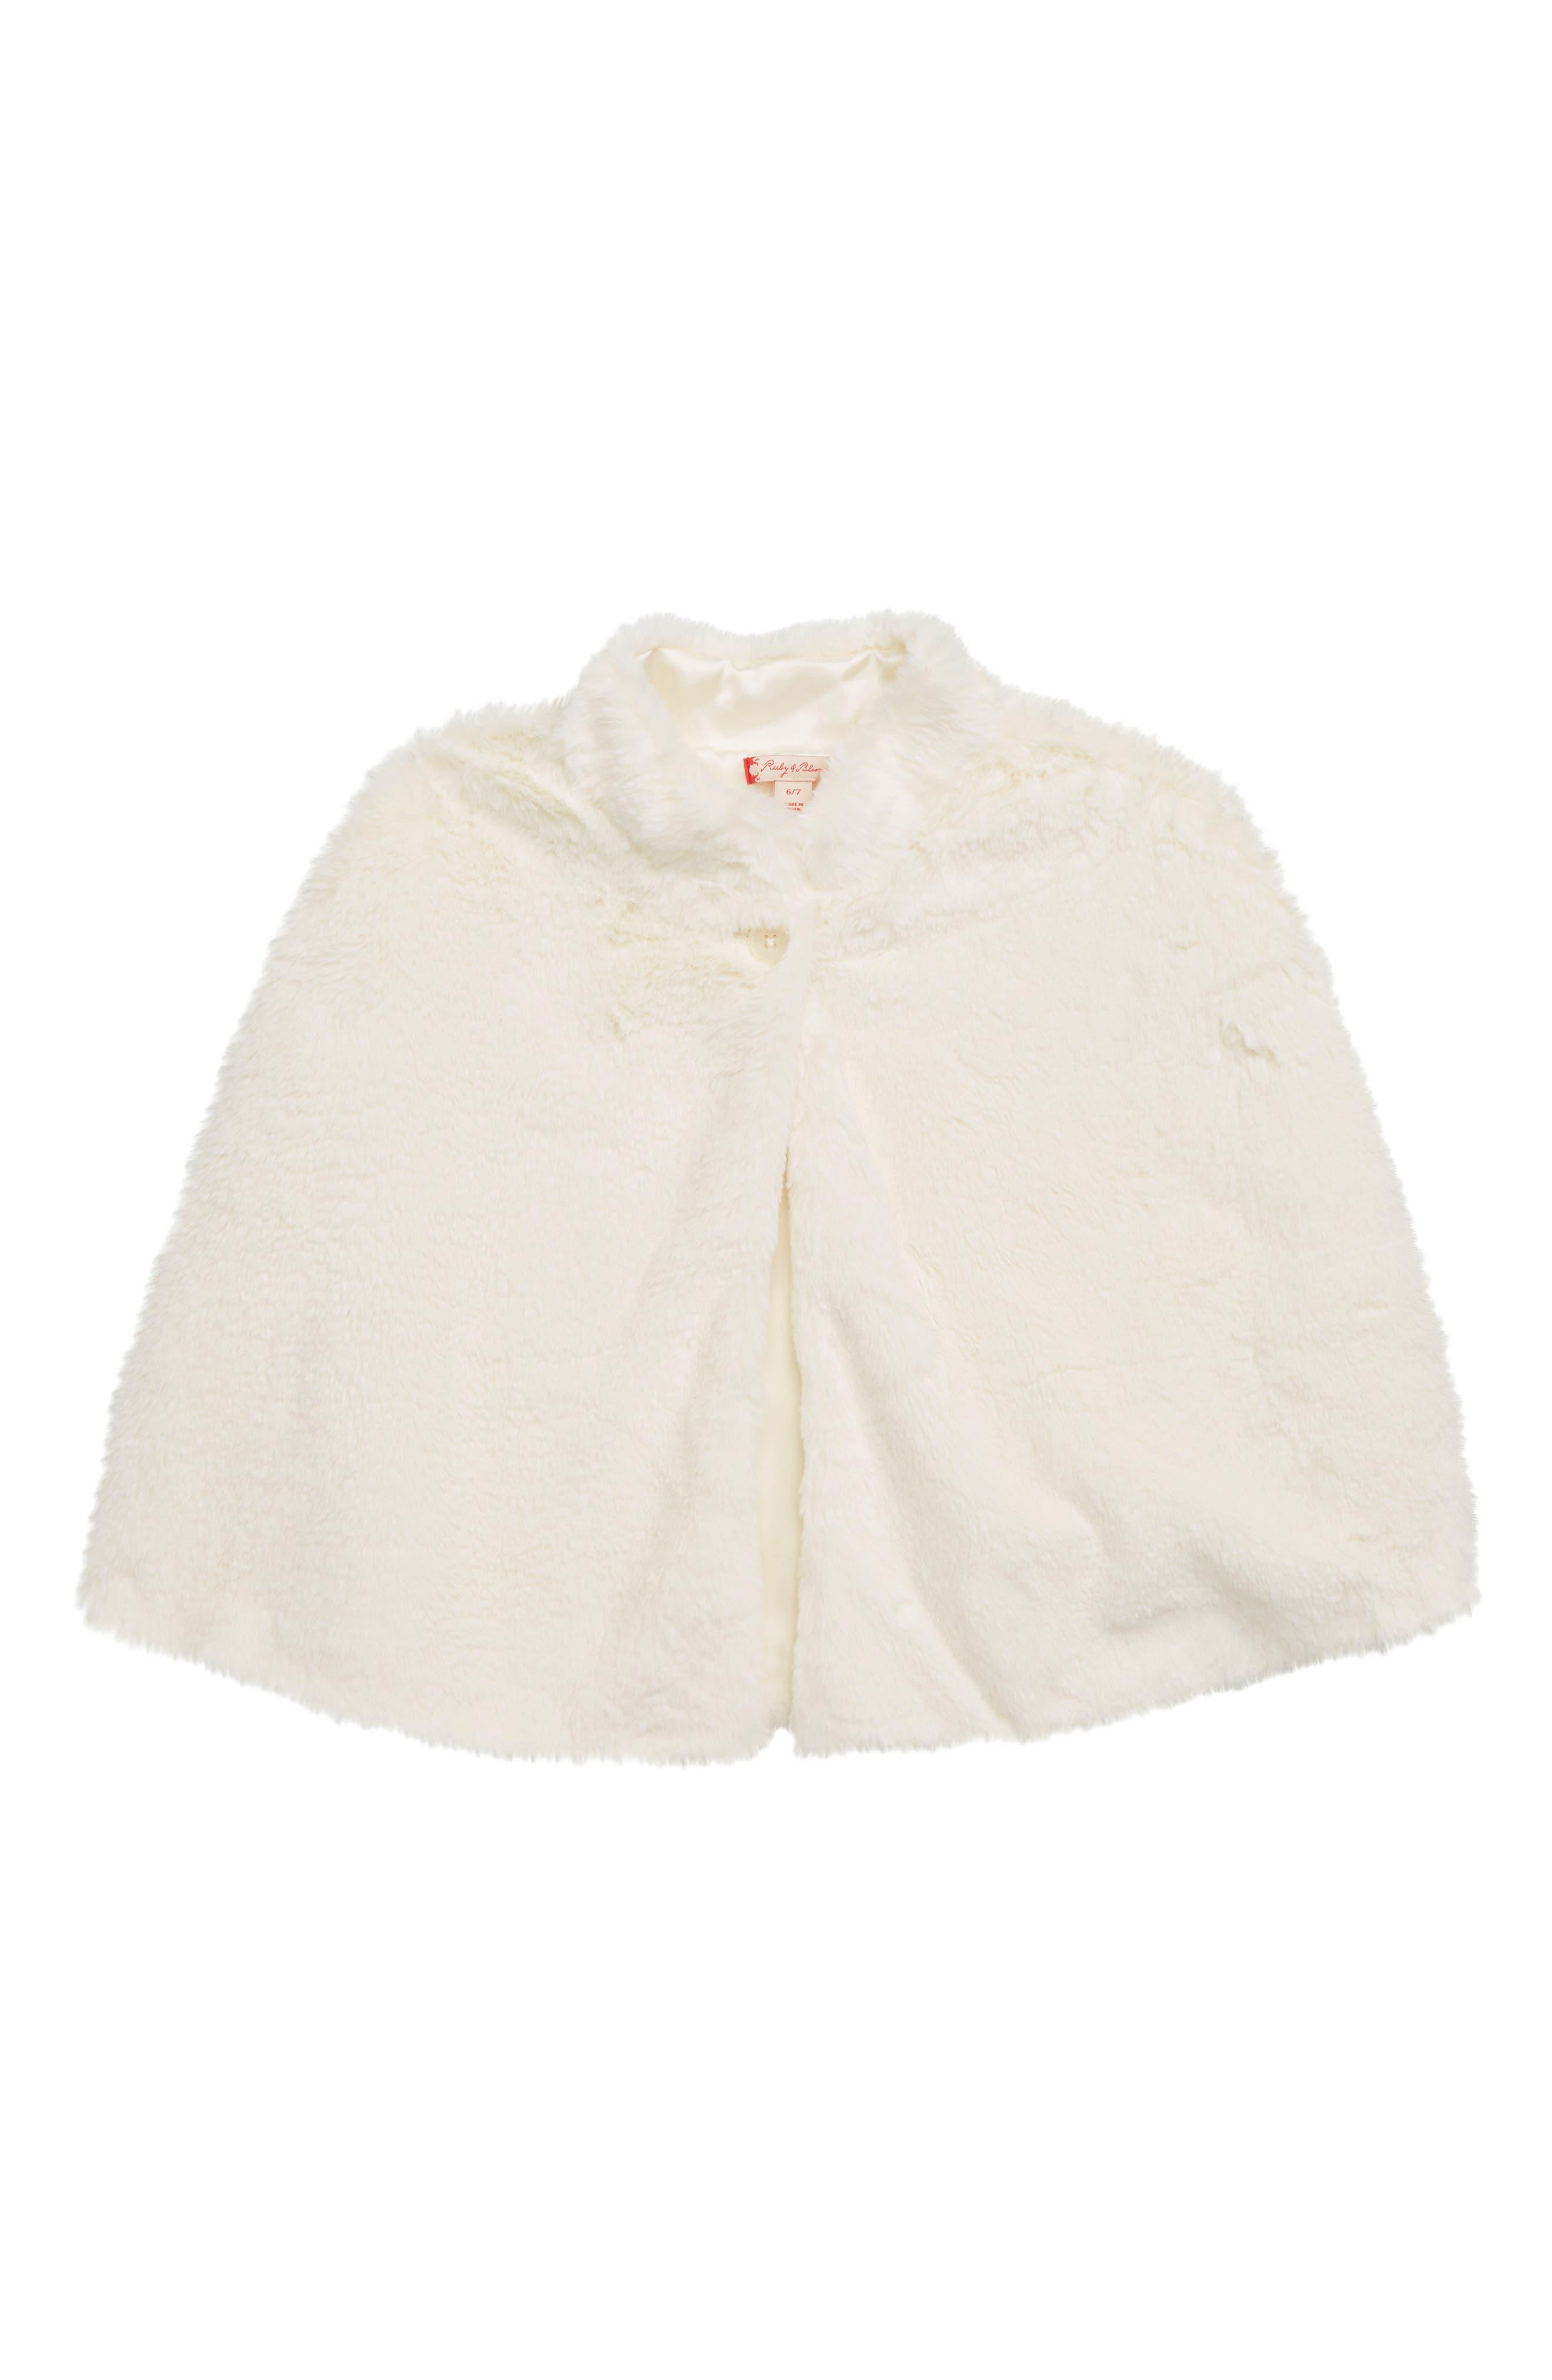 Vintage Style Children's Clothing: Girls, Boys, Baby, Toddler Toddler Girls Ruby  Bloom Faux Fur Cape Size 2-3T - Ivory $32.98 AT vintagedancer.com